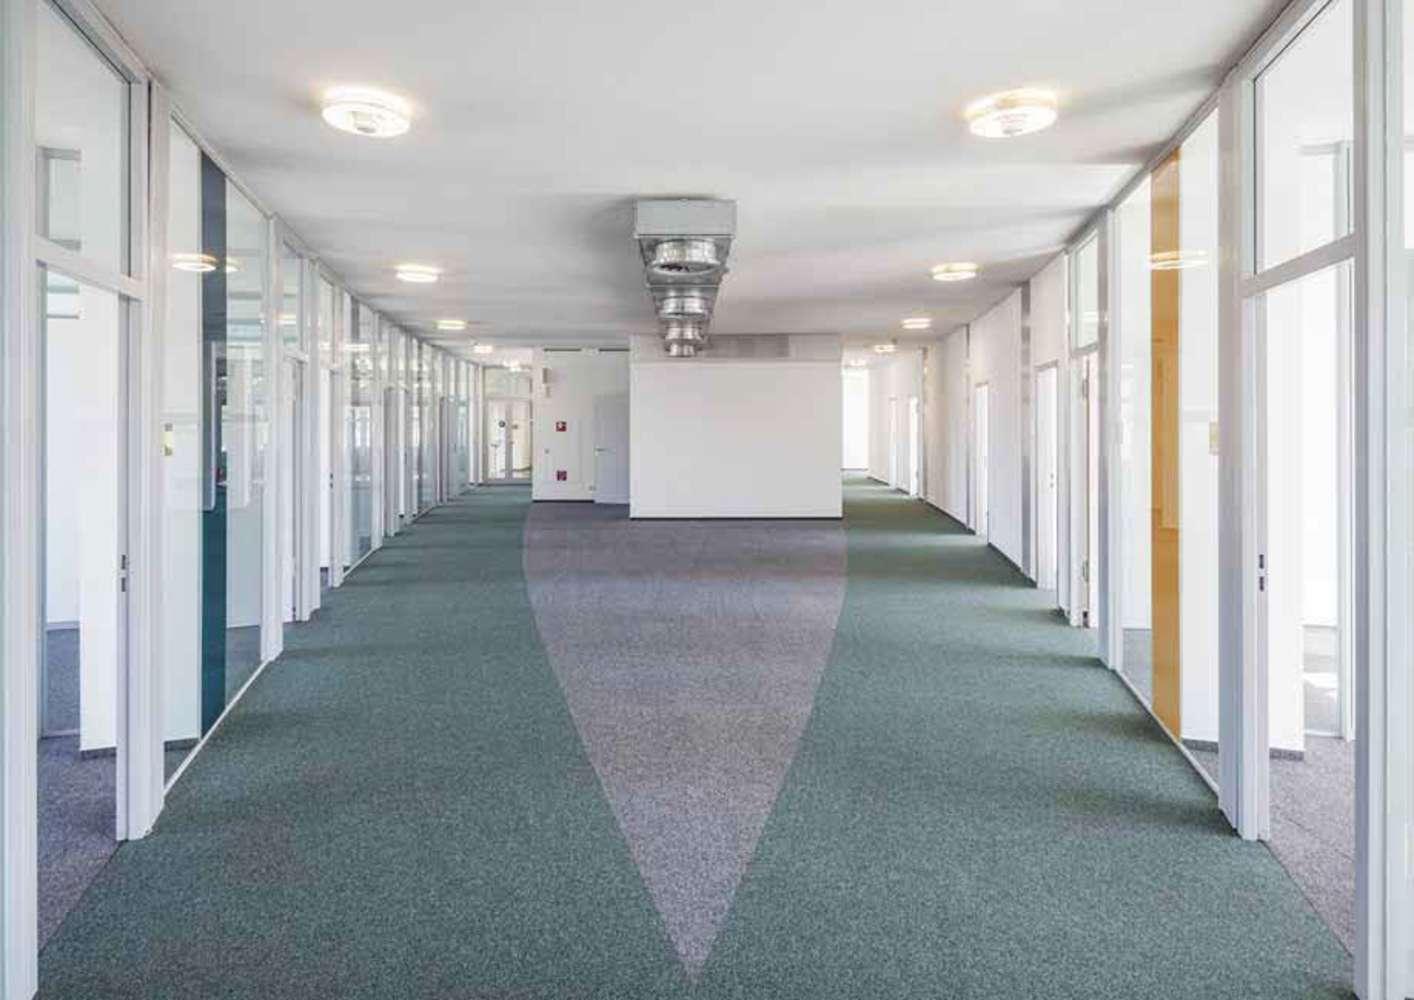 Büros Frankfurt am main, 65926 - Büro - Frankfurt am Main, Höchst - F2035 - 9518032